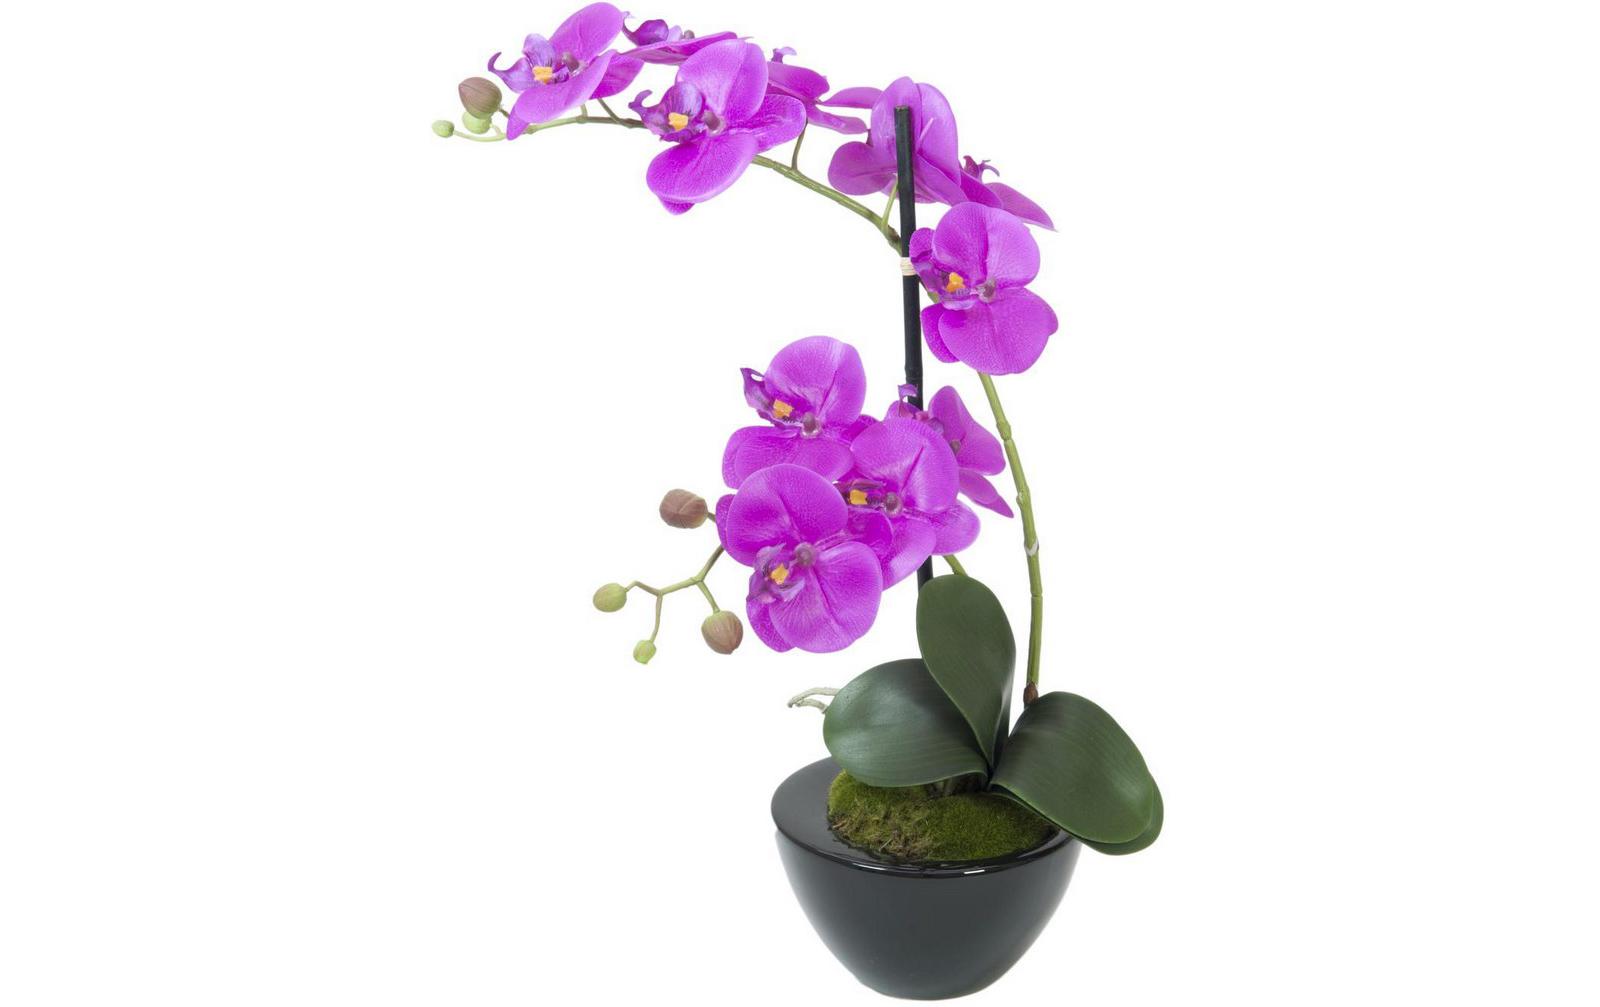 europalms-orchideen-arrangement-4-kunststoffpflanze